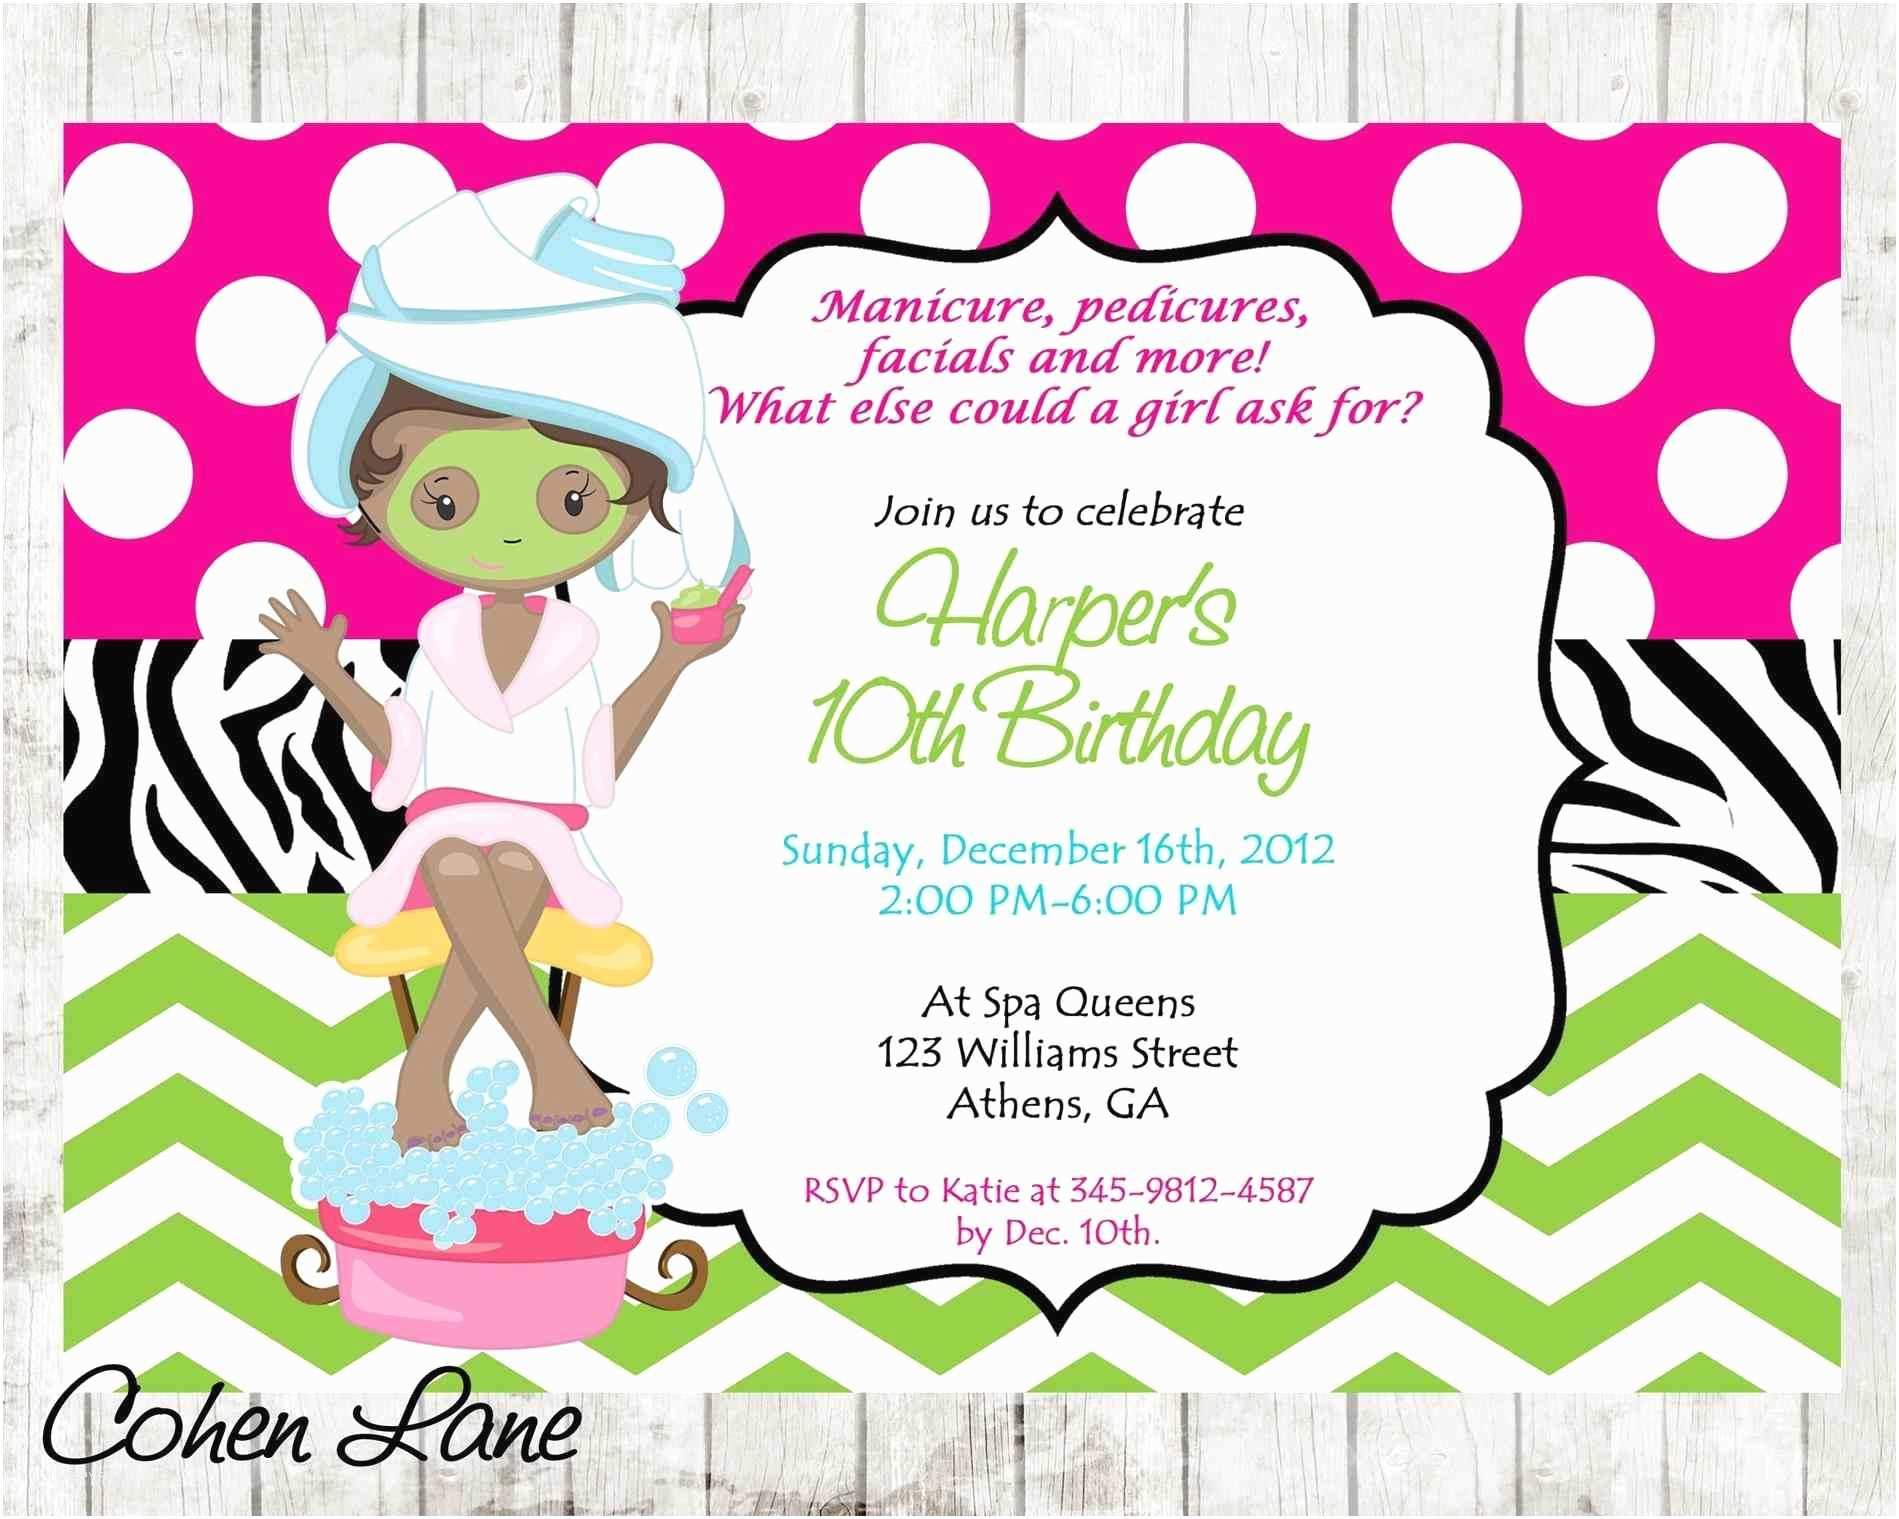 Girls Party Invitations Cimvitation Girl Girls Spa Party Invitations Cimvitation